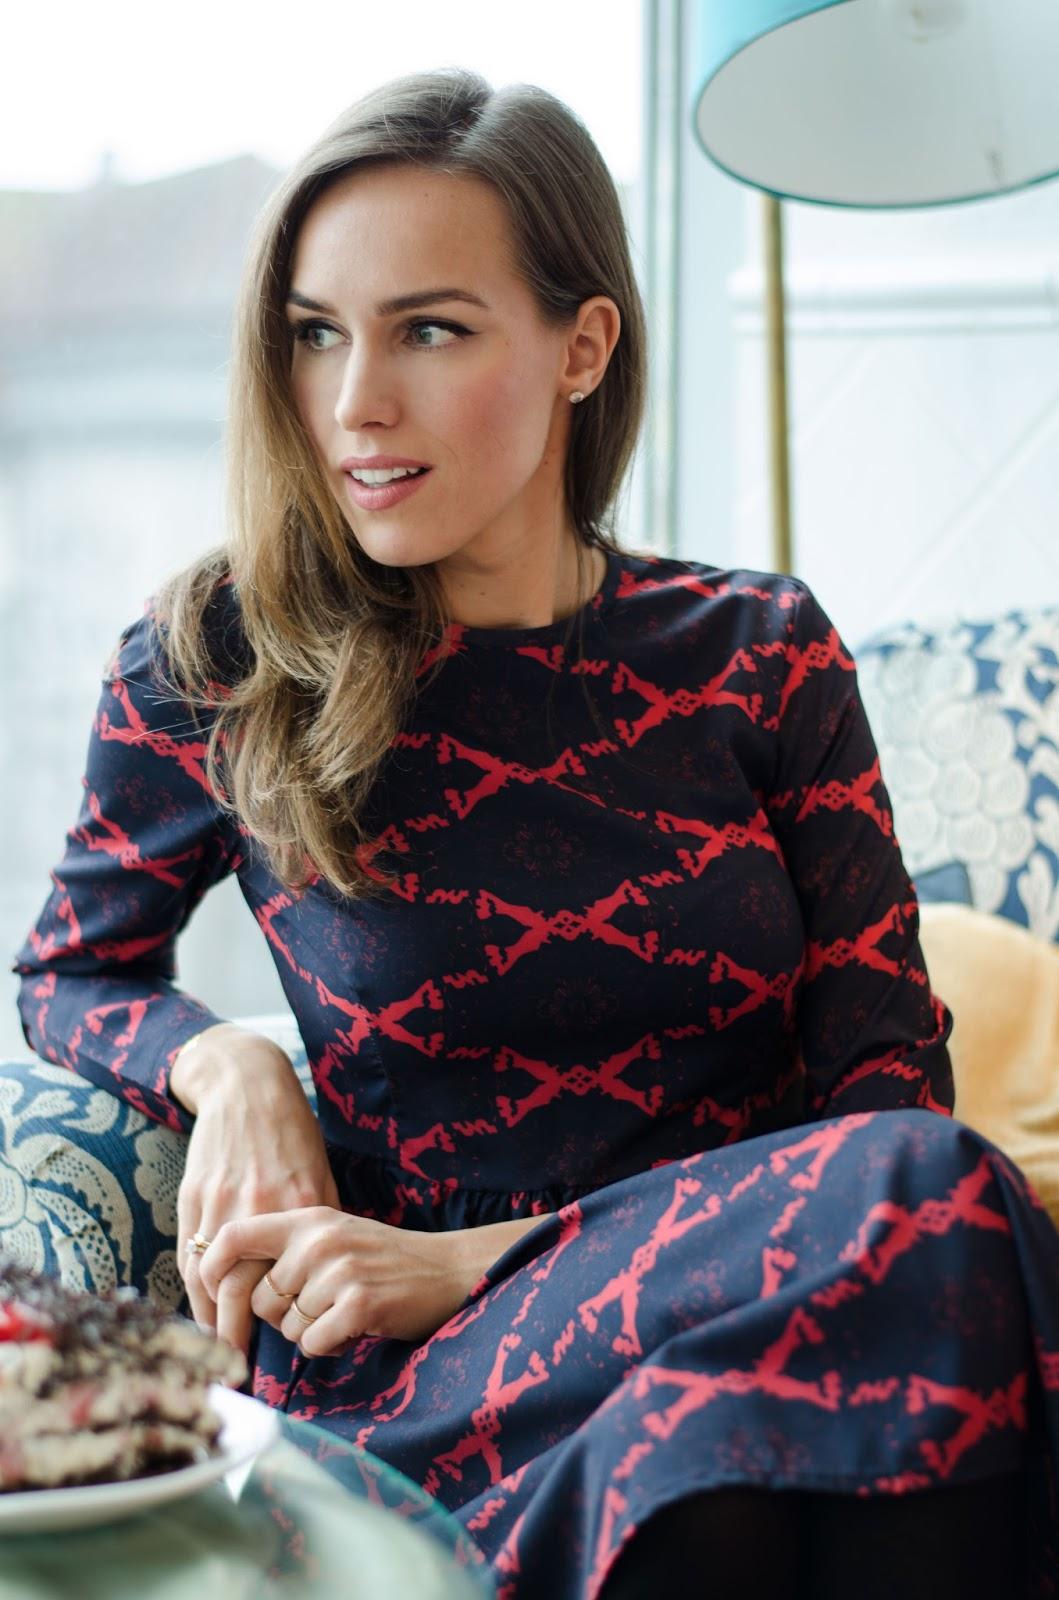 kristjaana mere printed dark blue red patterned boat neck dress